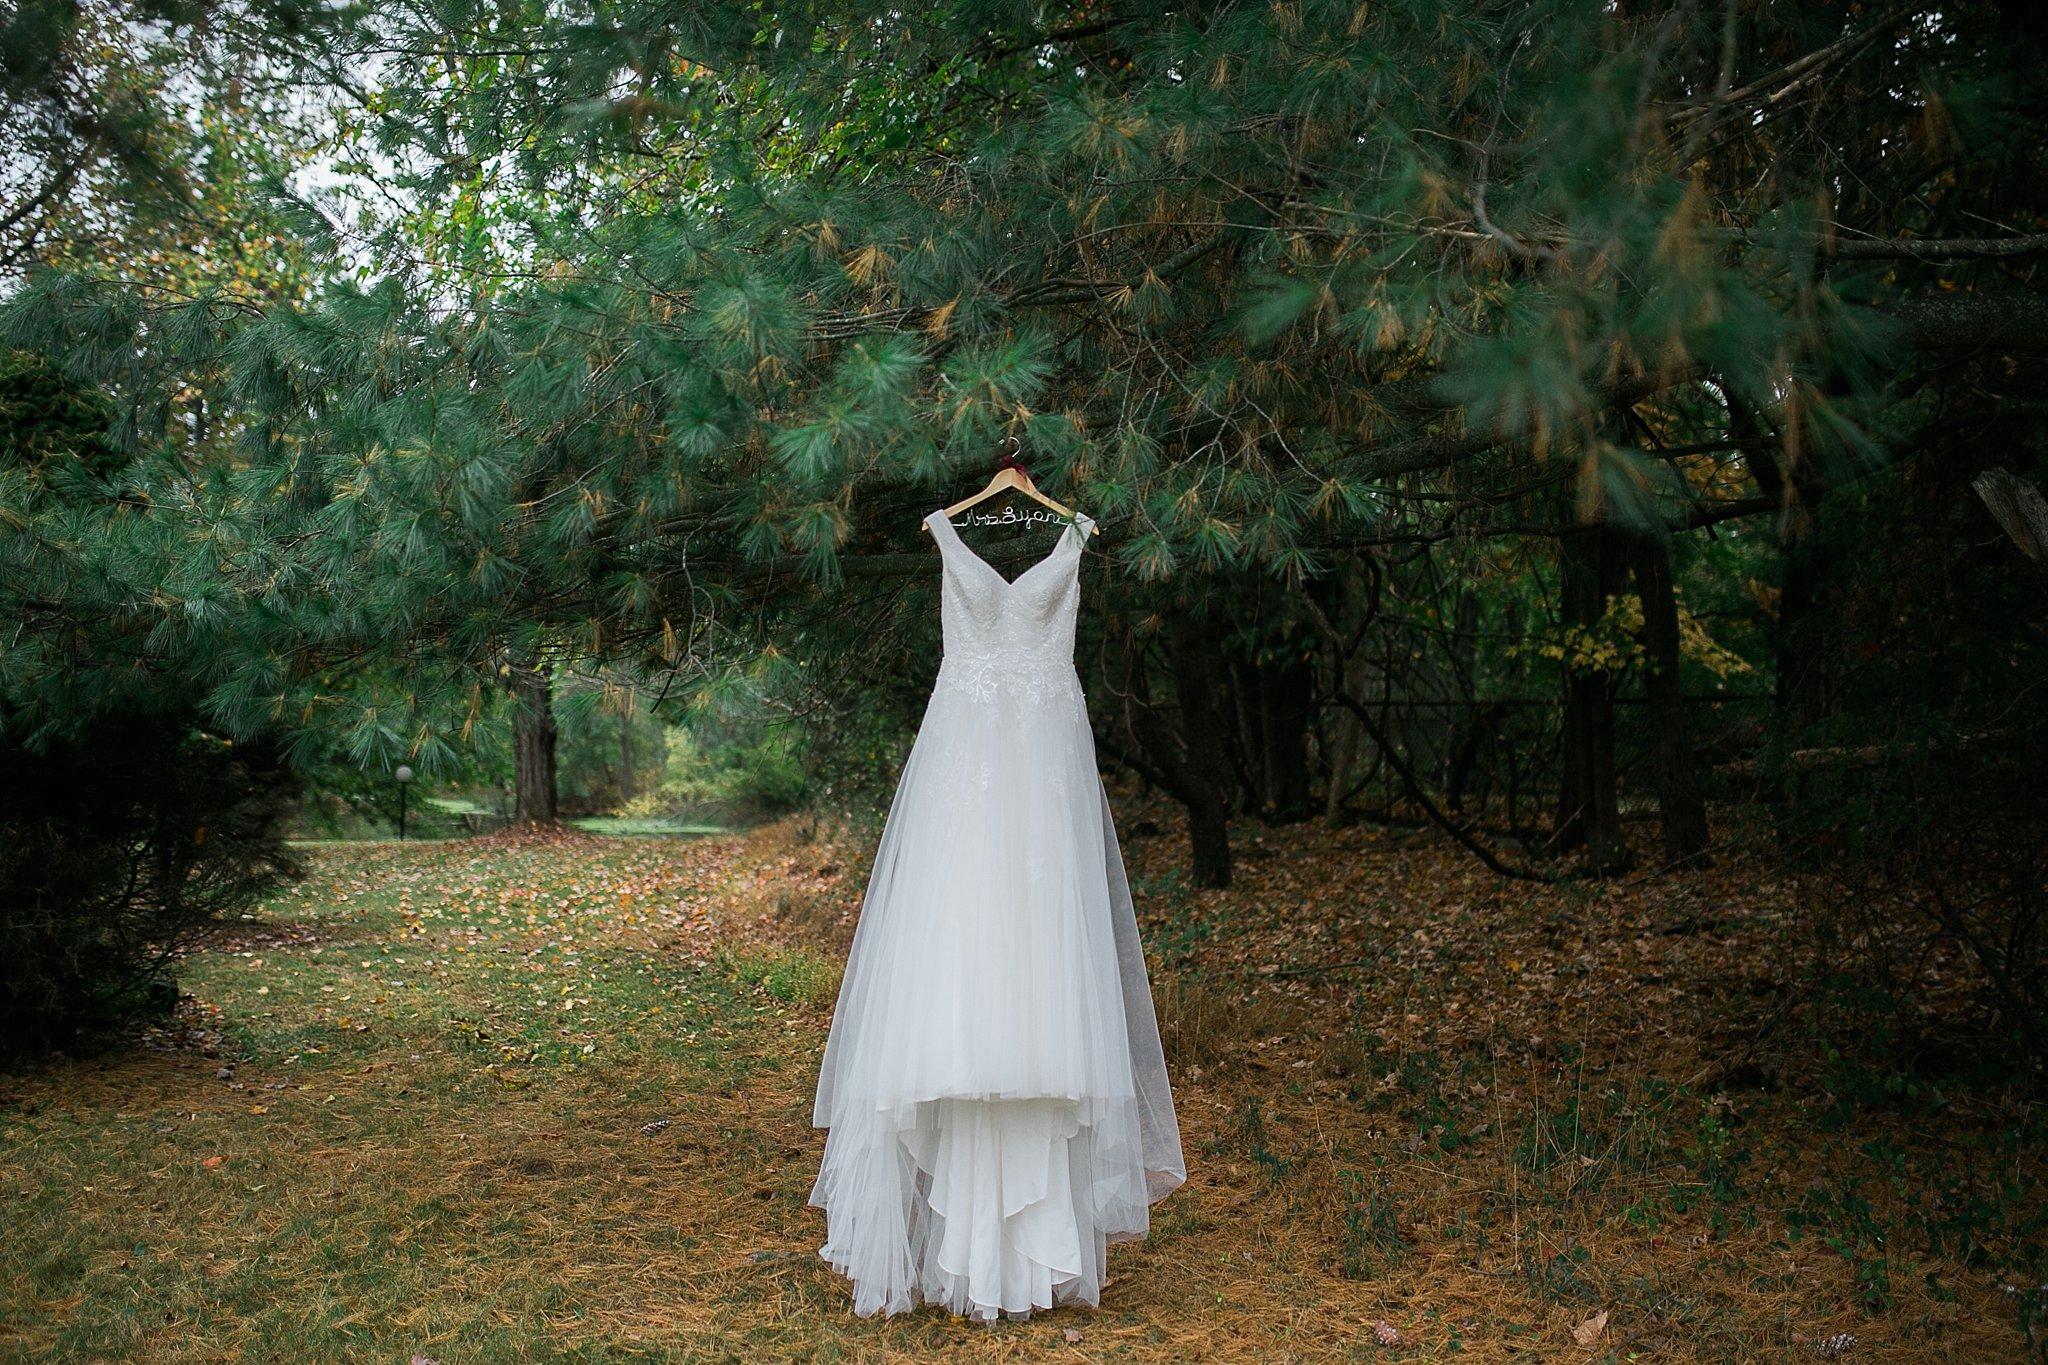 New Windsor New York Hudson Valley New York Wedding Photographer 1.jpg